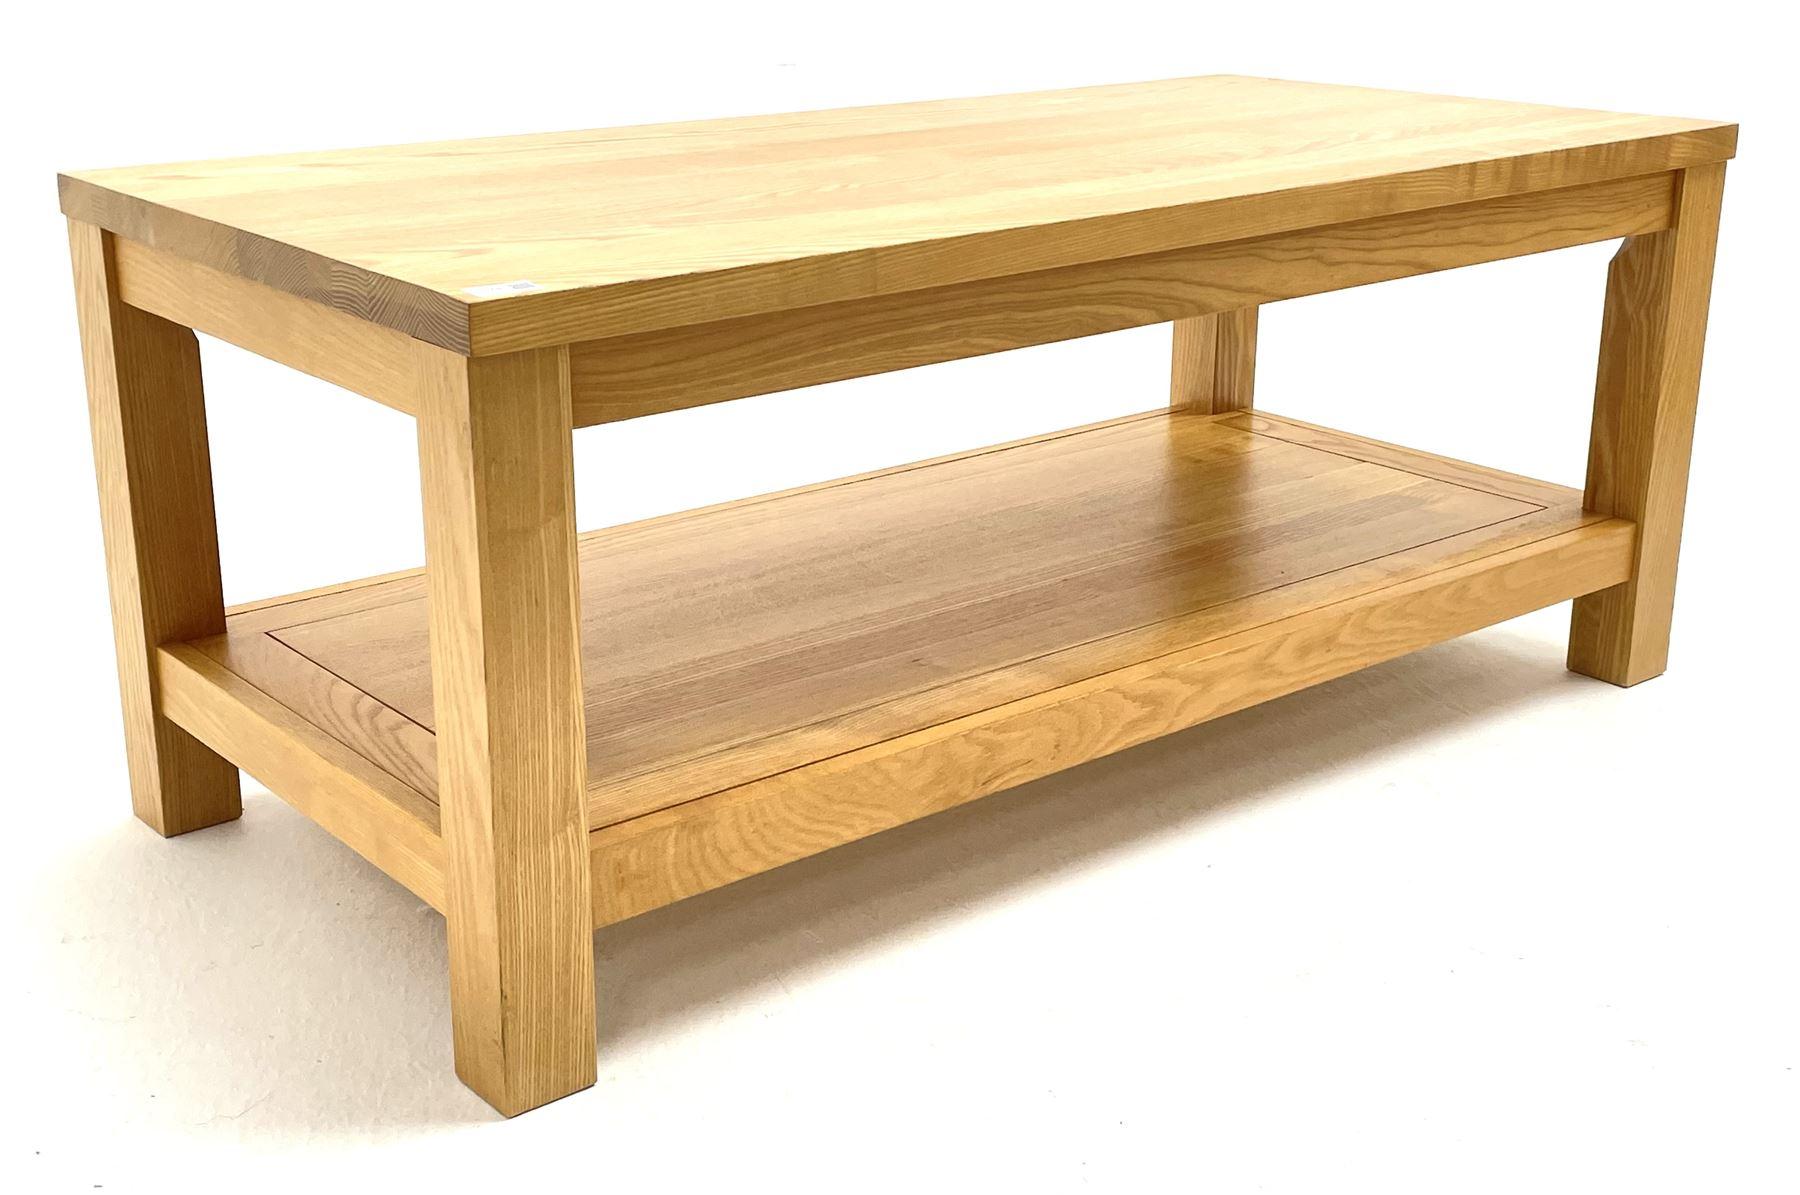 Light oak rectangular coffee table with undertier